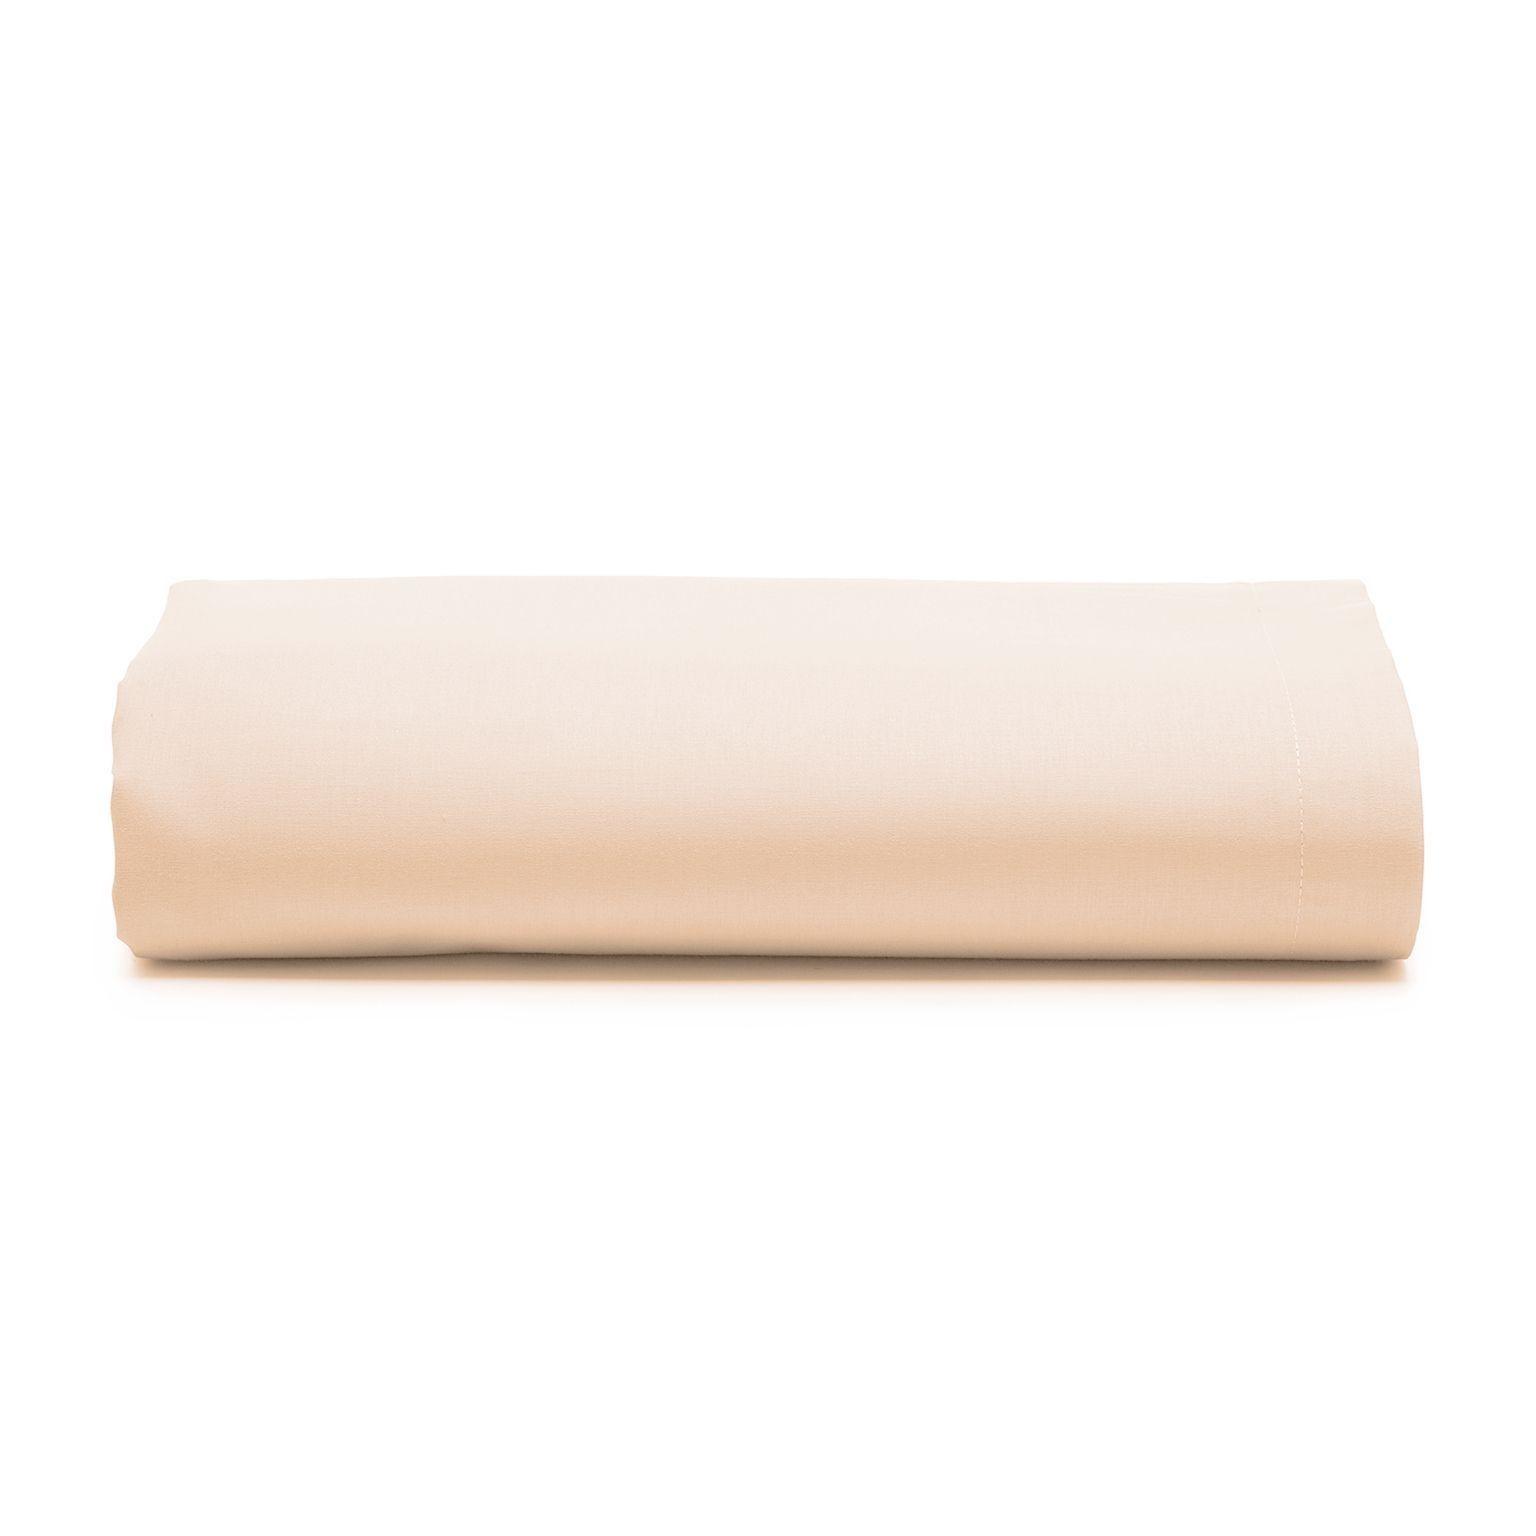 Lencol Casal Royal com Elastico 100 algodao Bege 140x190 cm Bege - Santista